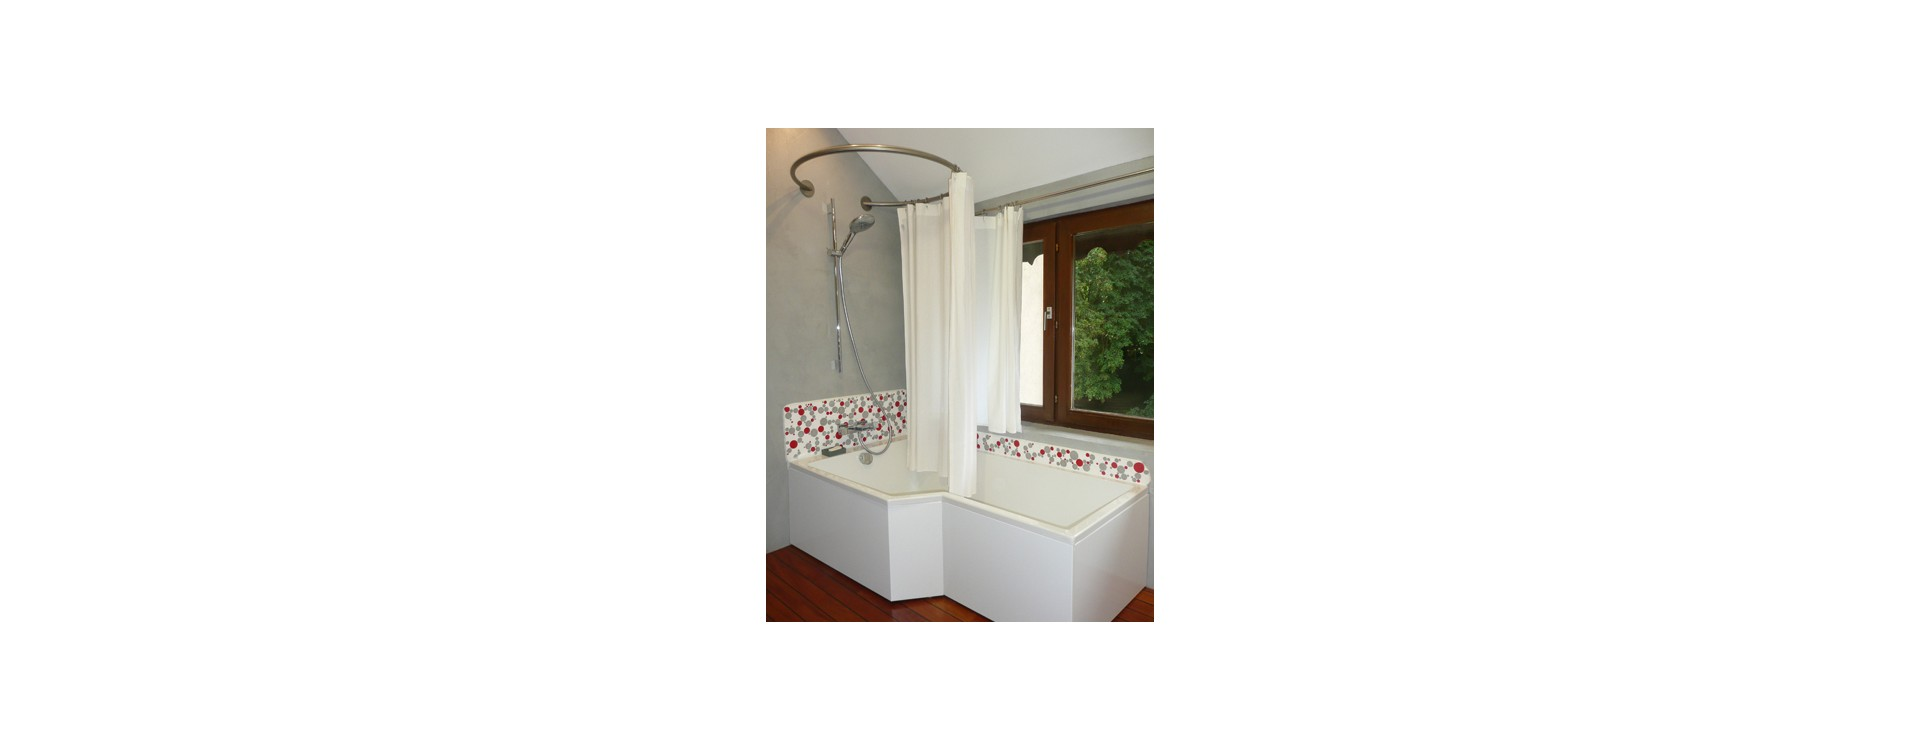 La baignoire bain-douche Neo de Jacob Delafon et GalboBain